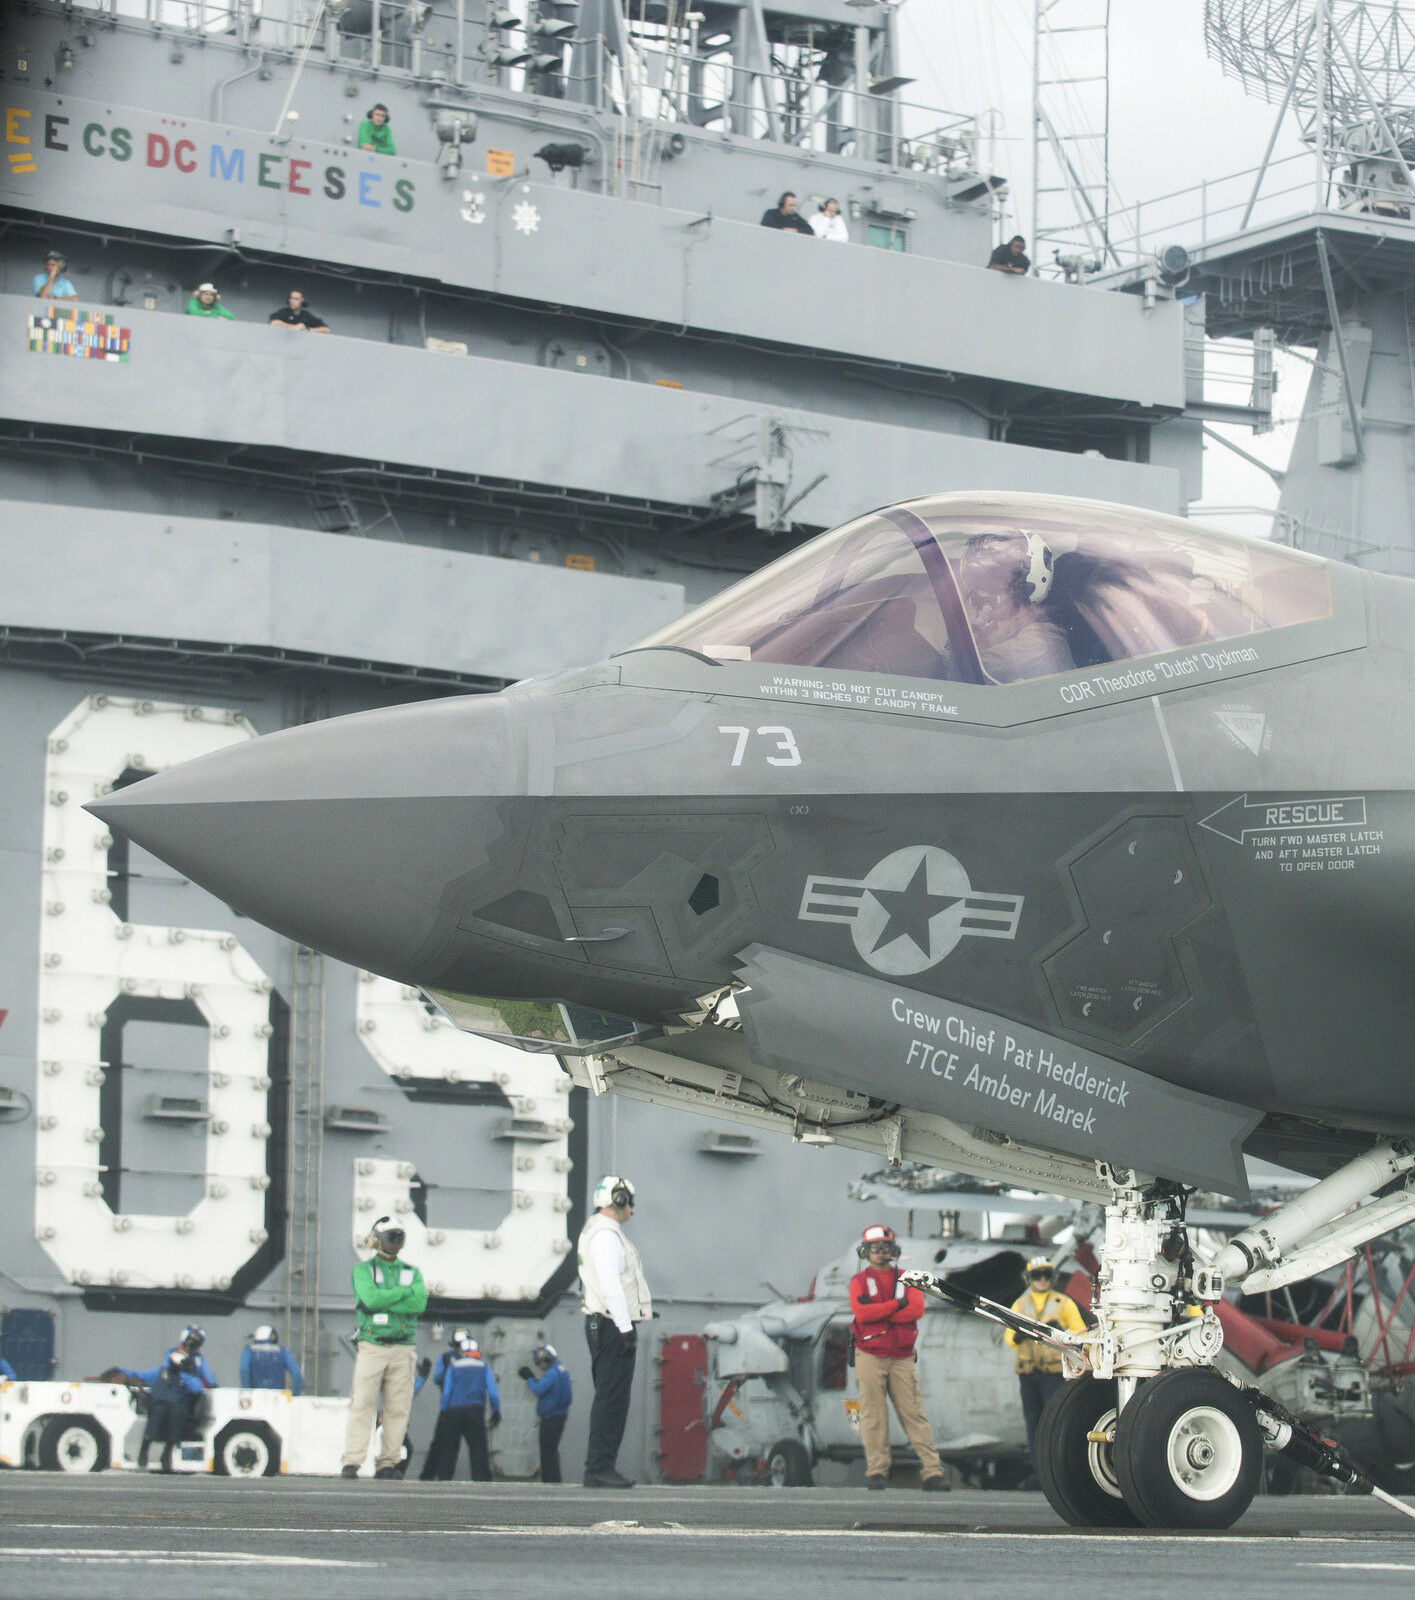 1 ONE BATTLE E UNIFORM PATCH EFFICIENCY 2ND AWARD US NAVY USS SAILOR PIN UP